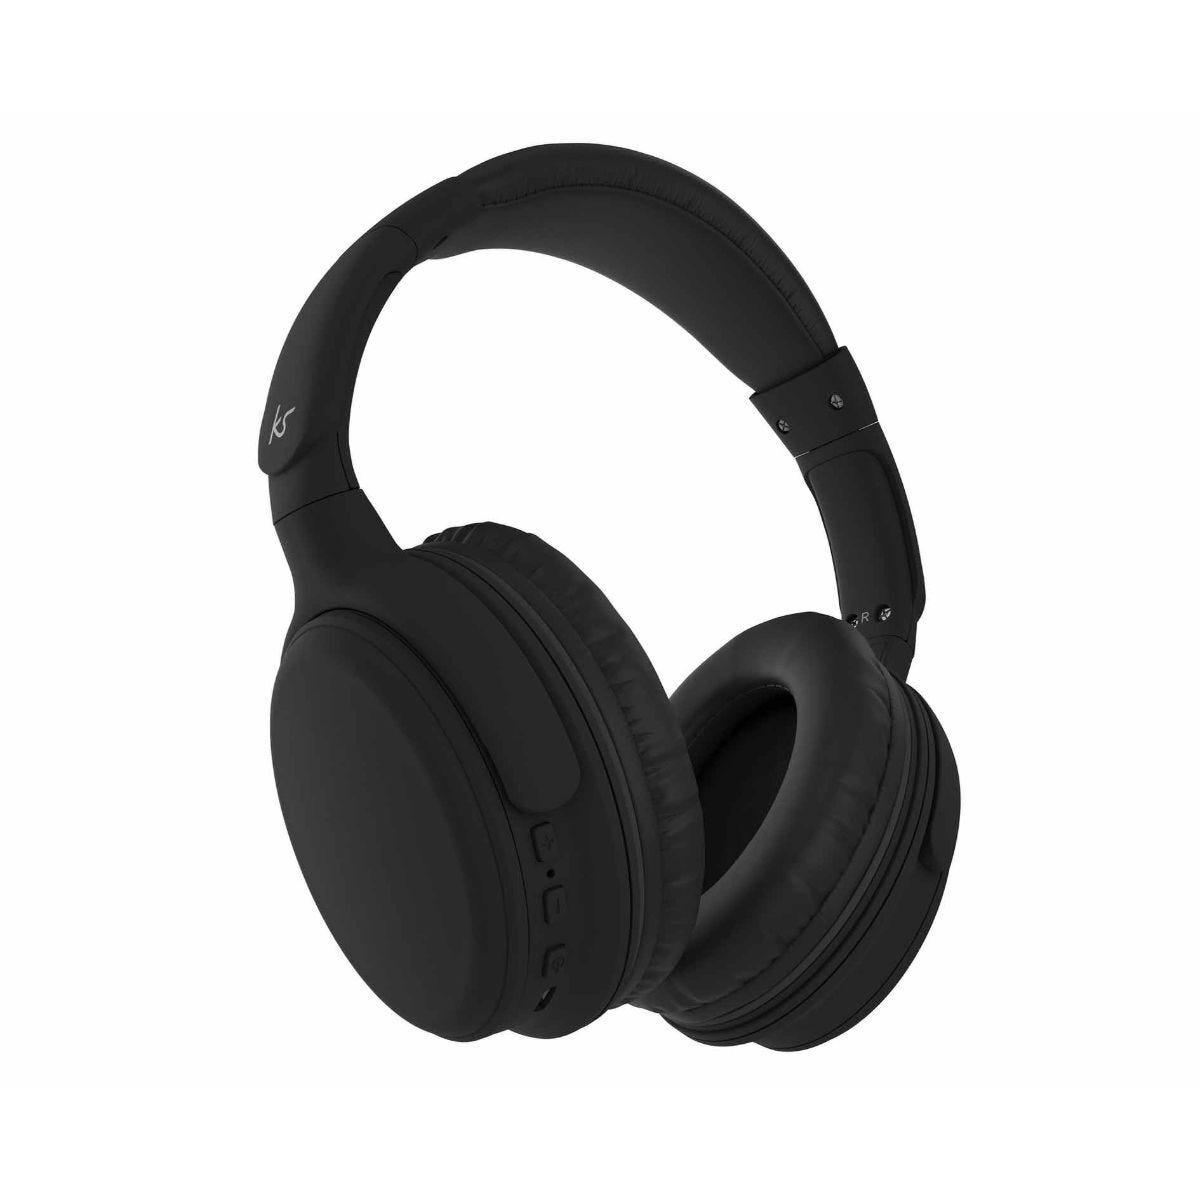 Kitsound Slammers Bluetooth Headphones